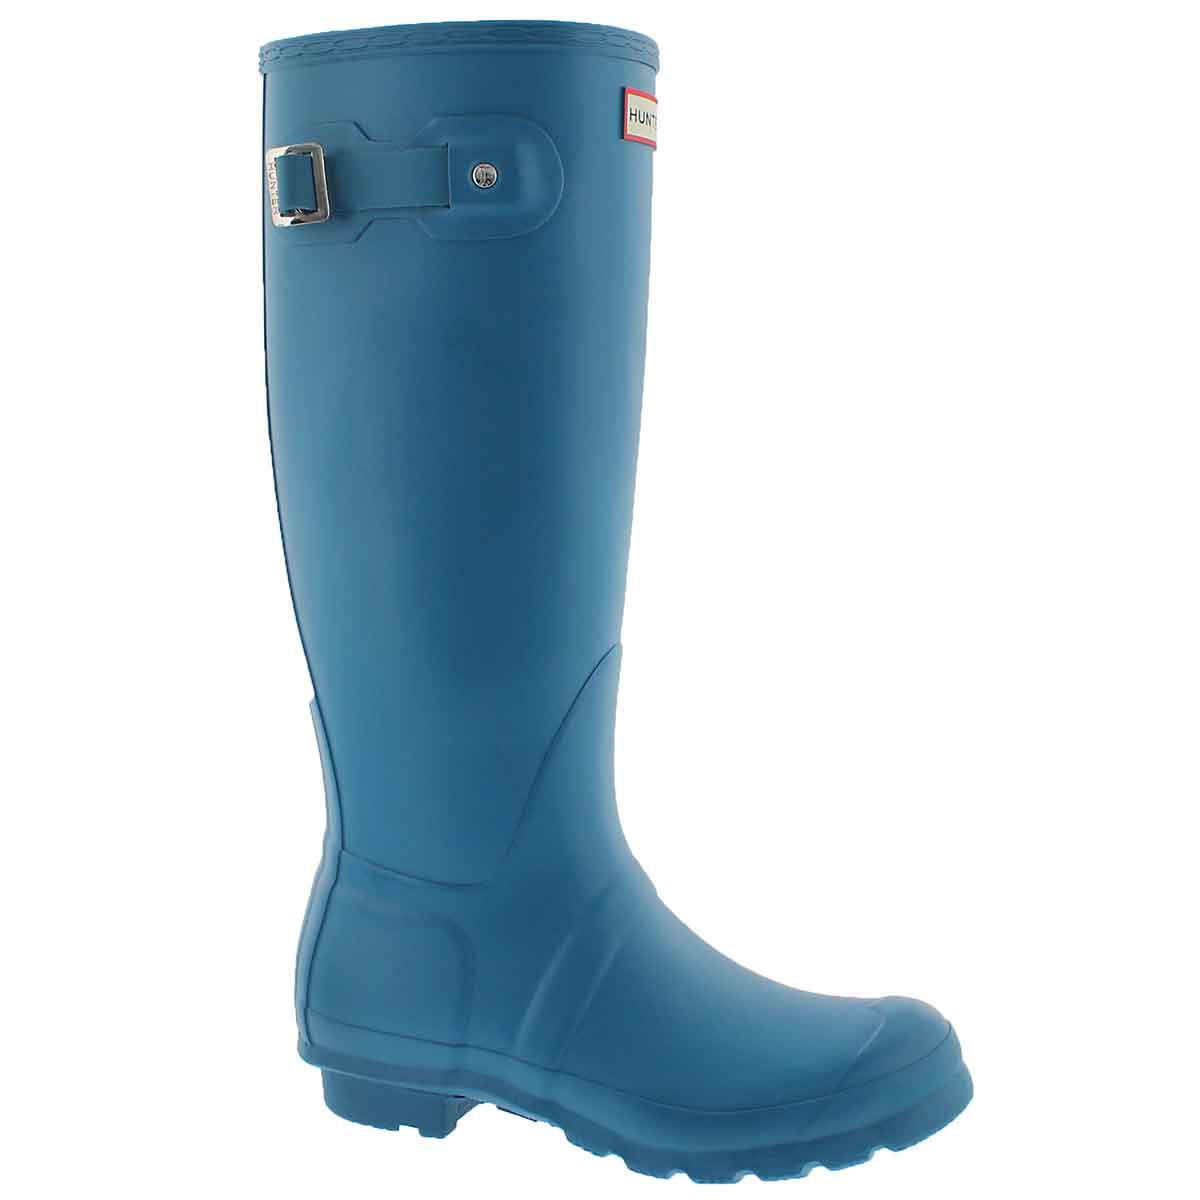 Women's ORIGINAL TALL CLASSIC blue rain boots